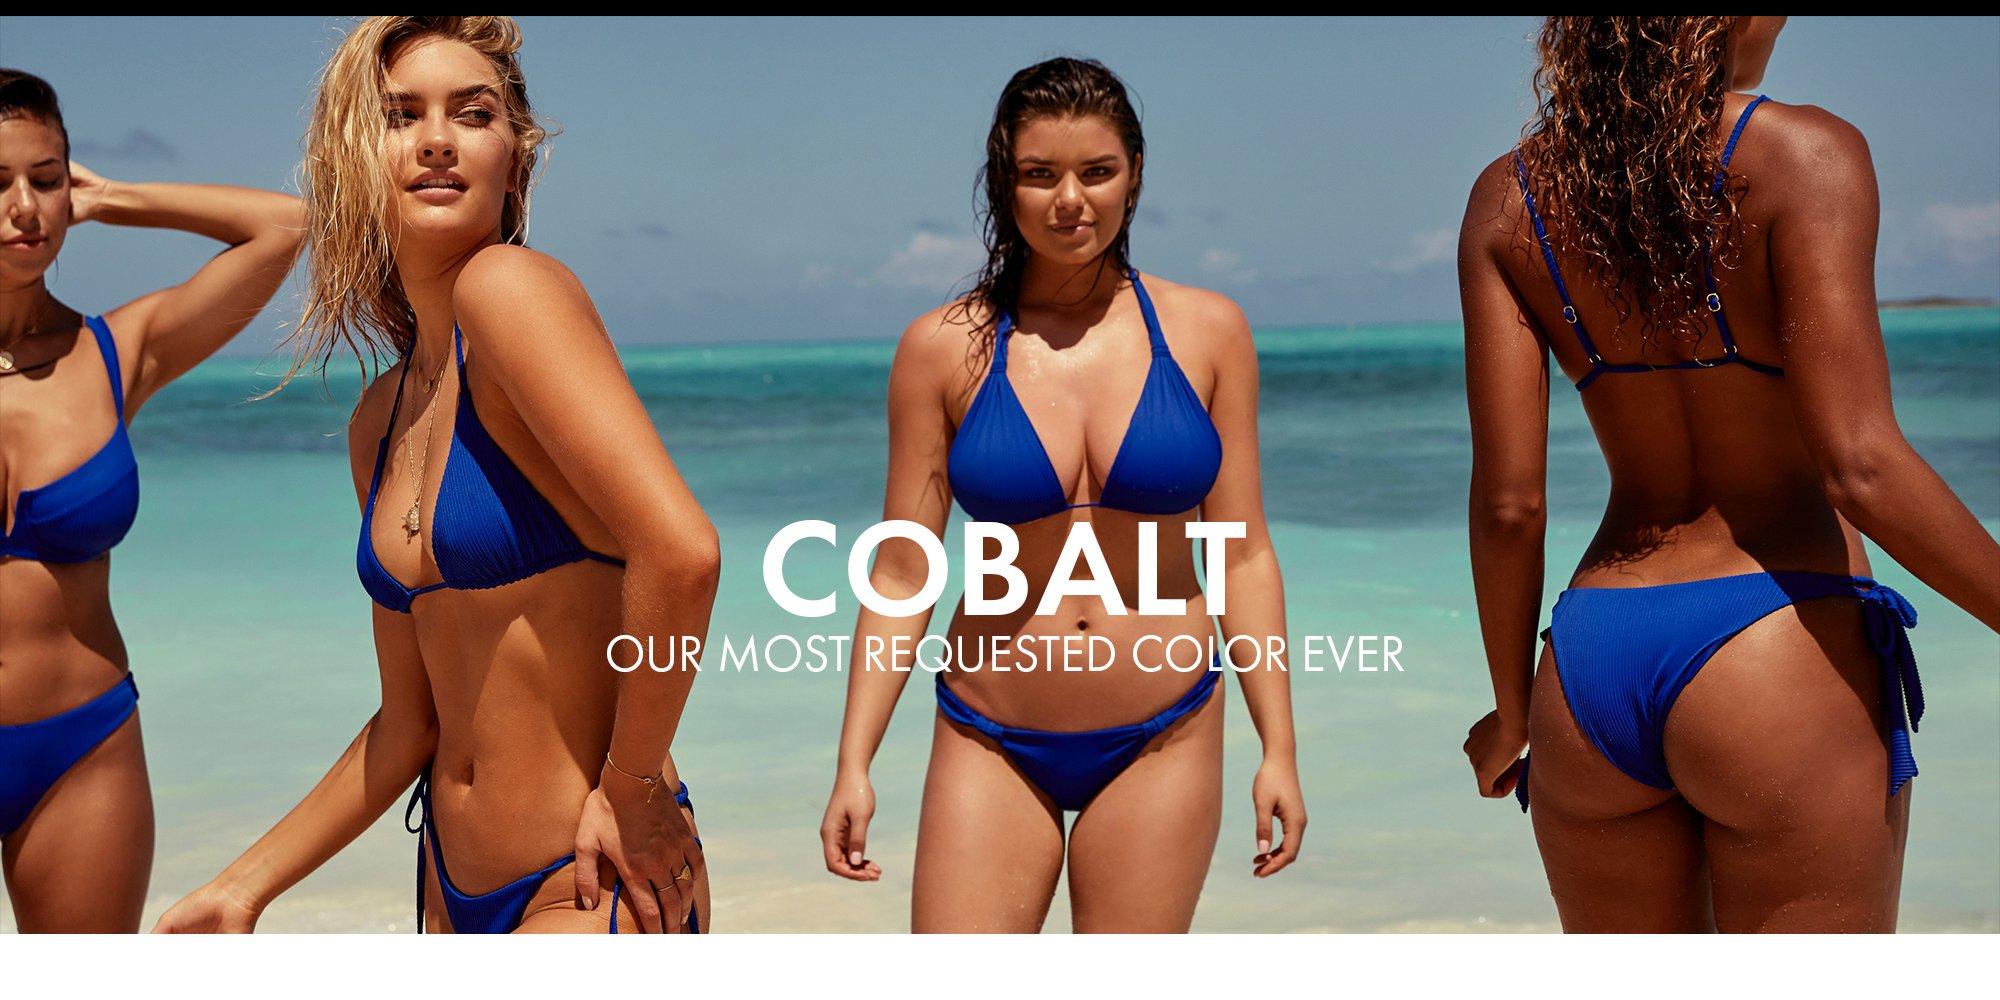 fdbf3c8713ee6 Shop Shop. Swimwear Swimwear · Beachwear Beachwear